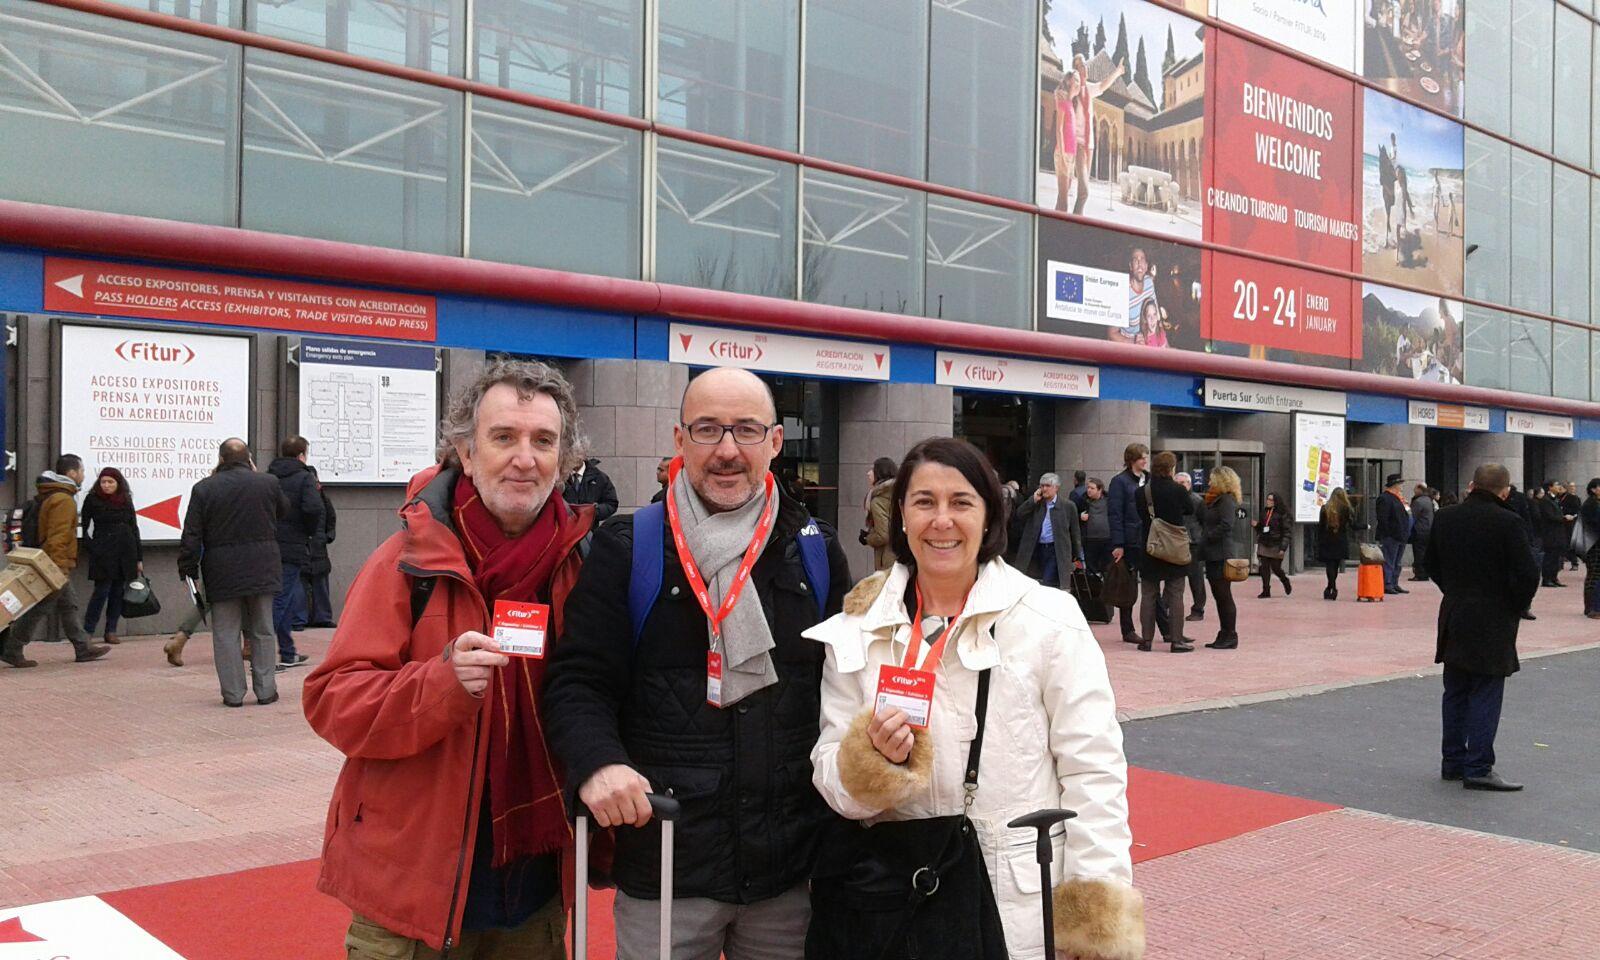 Joan, Ana y Àlex a su llegada a la feria Fitur 2016